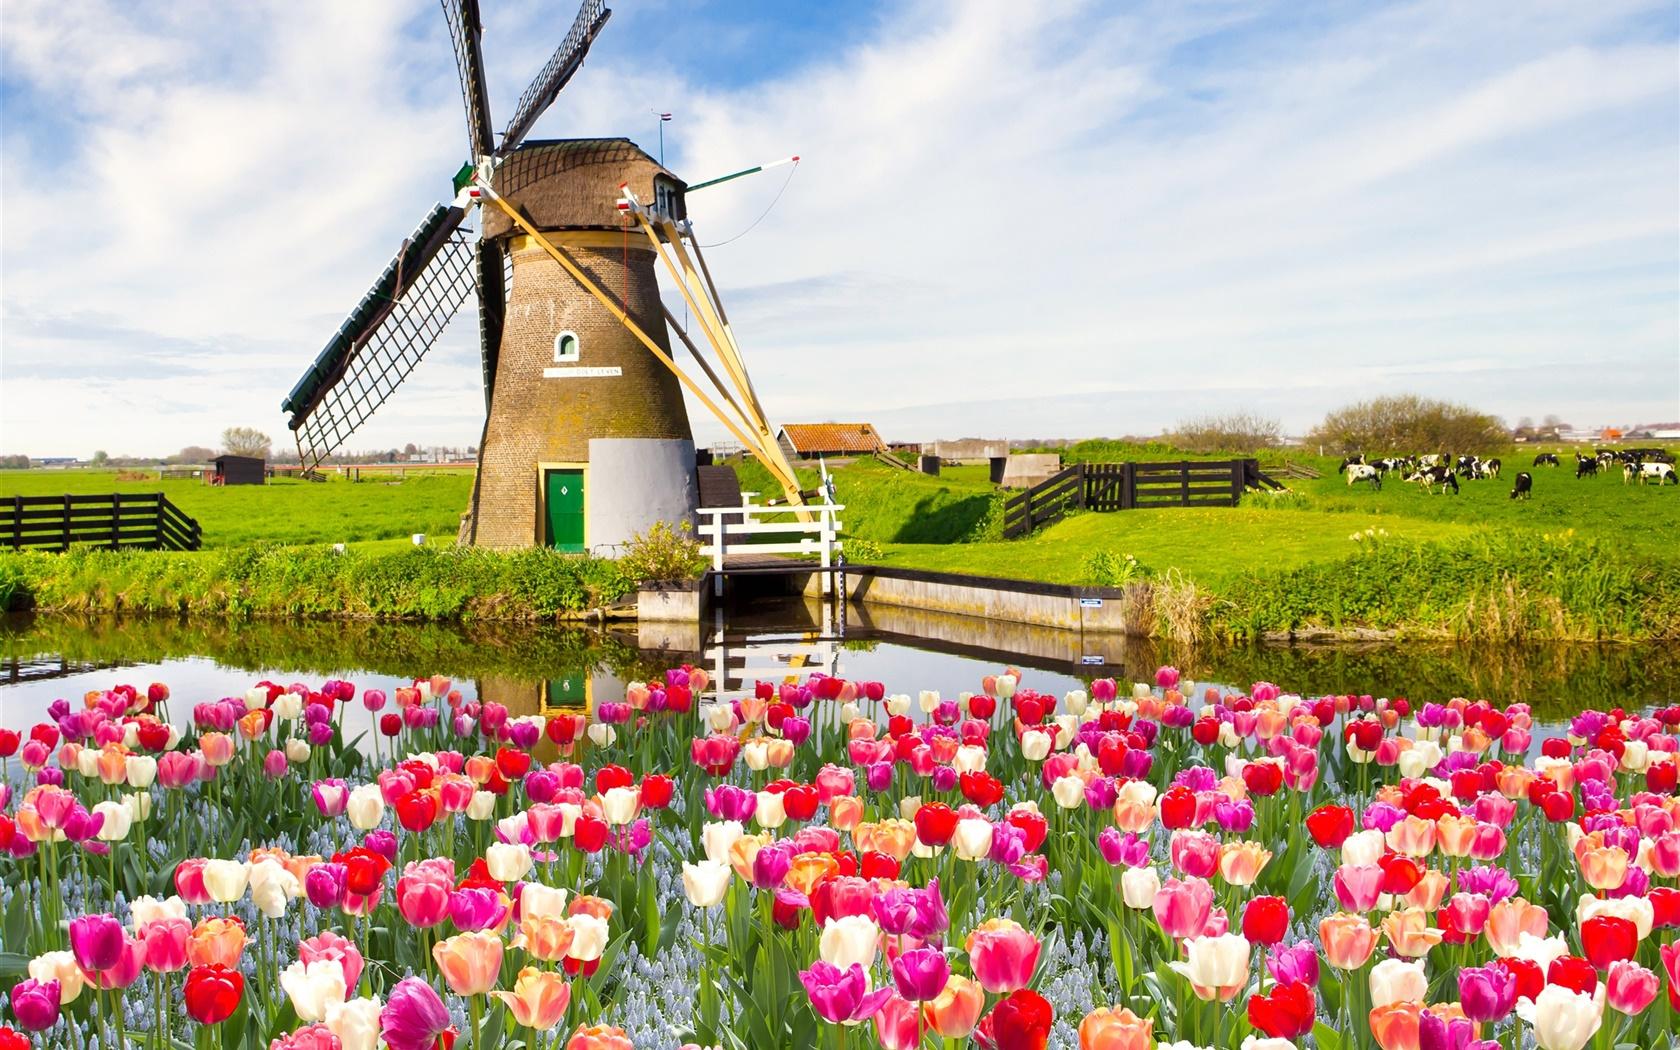 Village moulin vent fleurs de tulipes rivi re la for Immagini gratis per desktop primavera